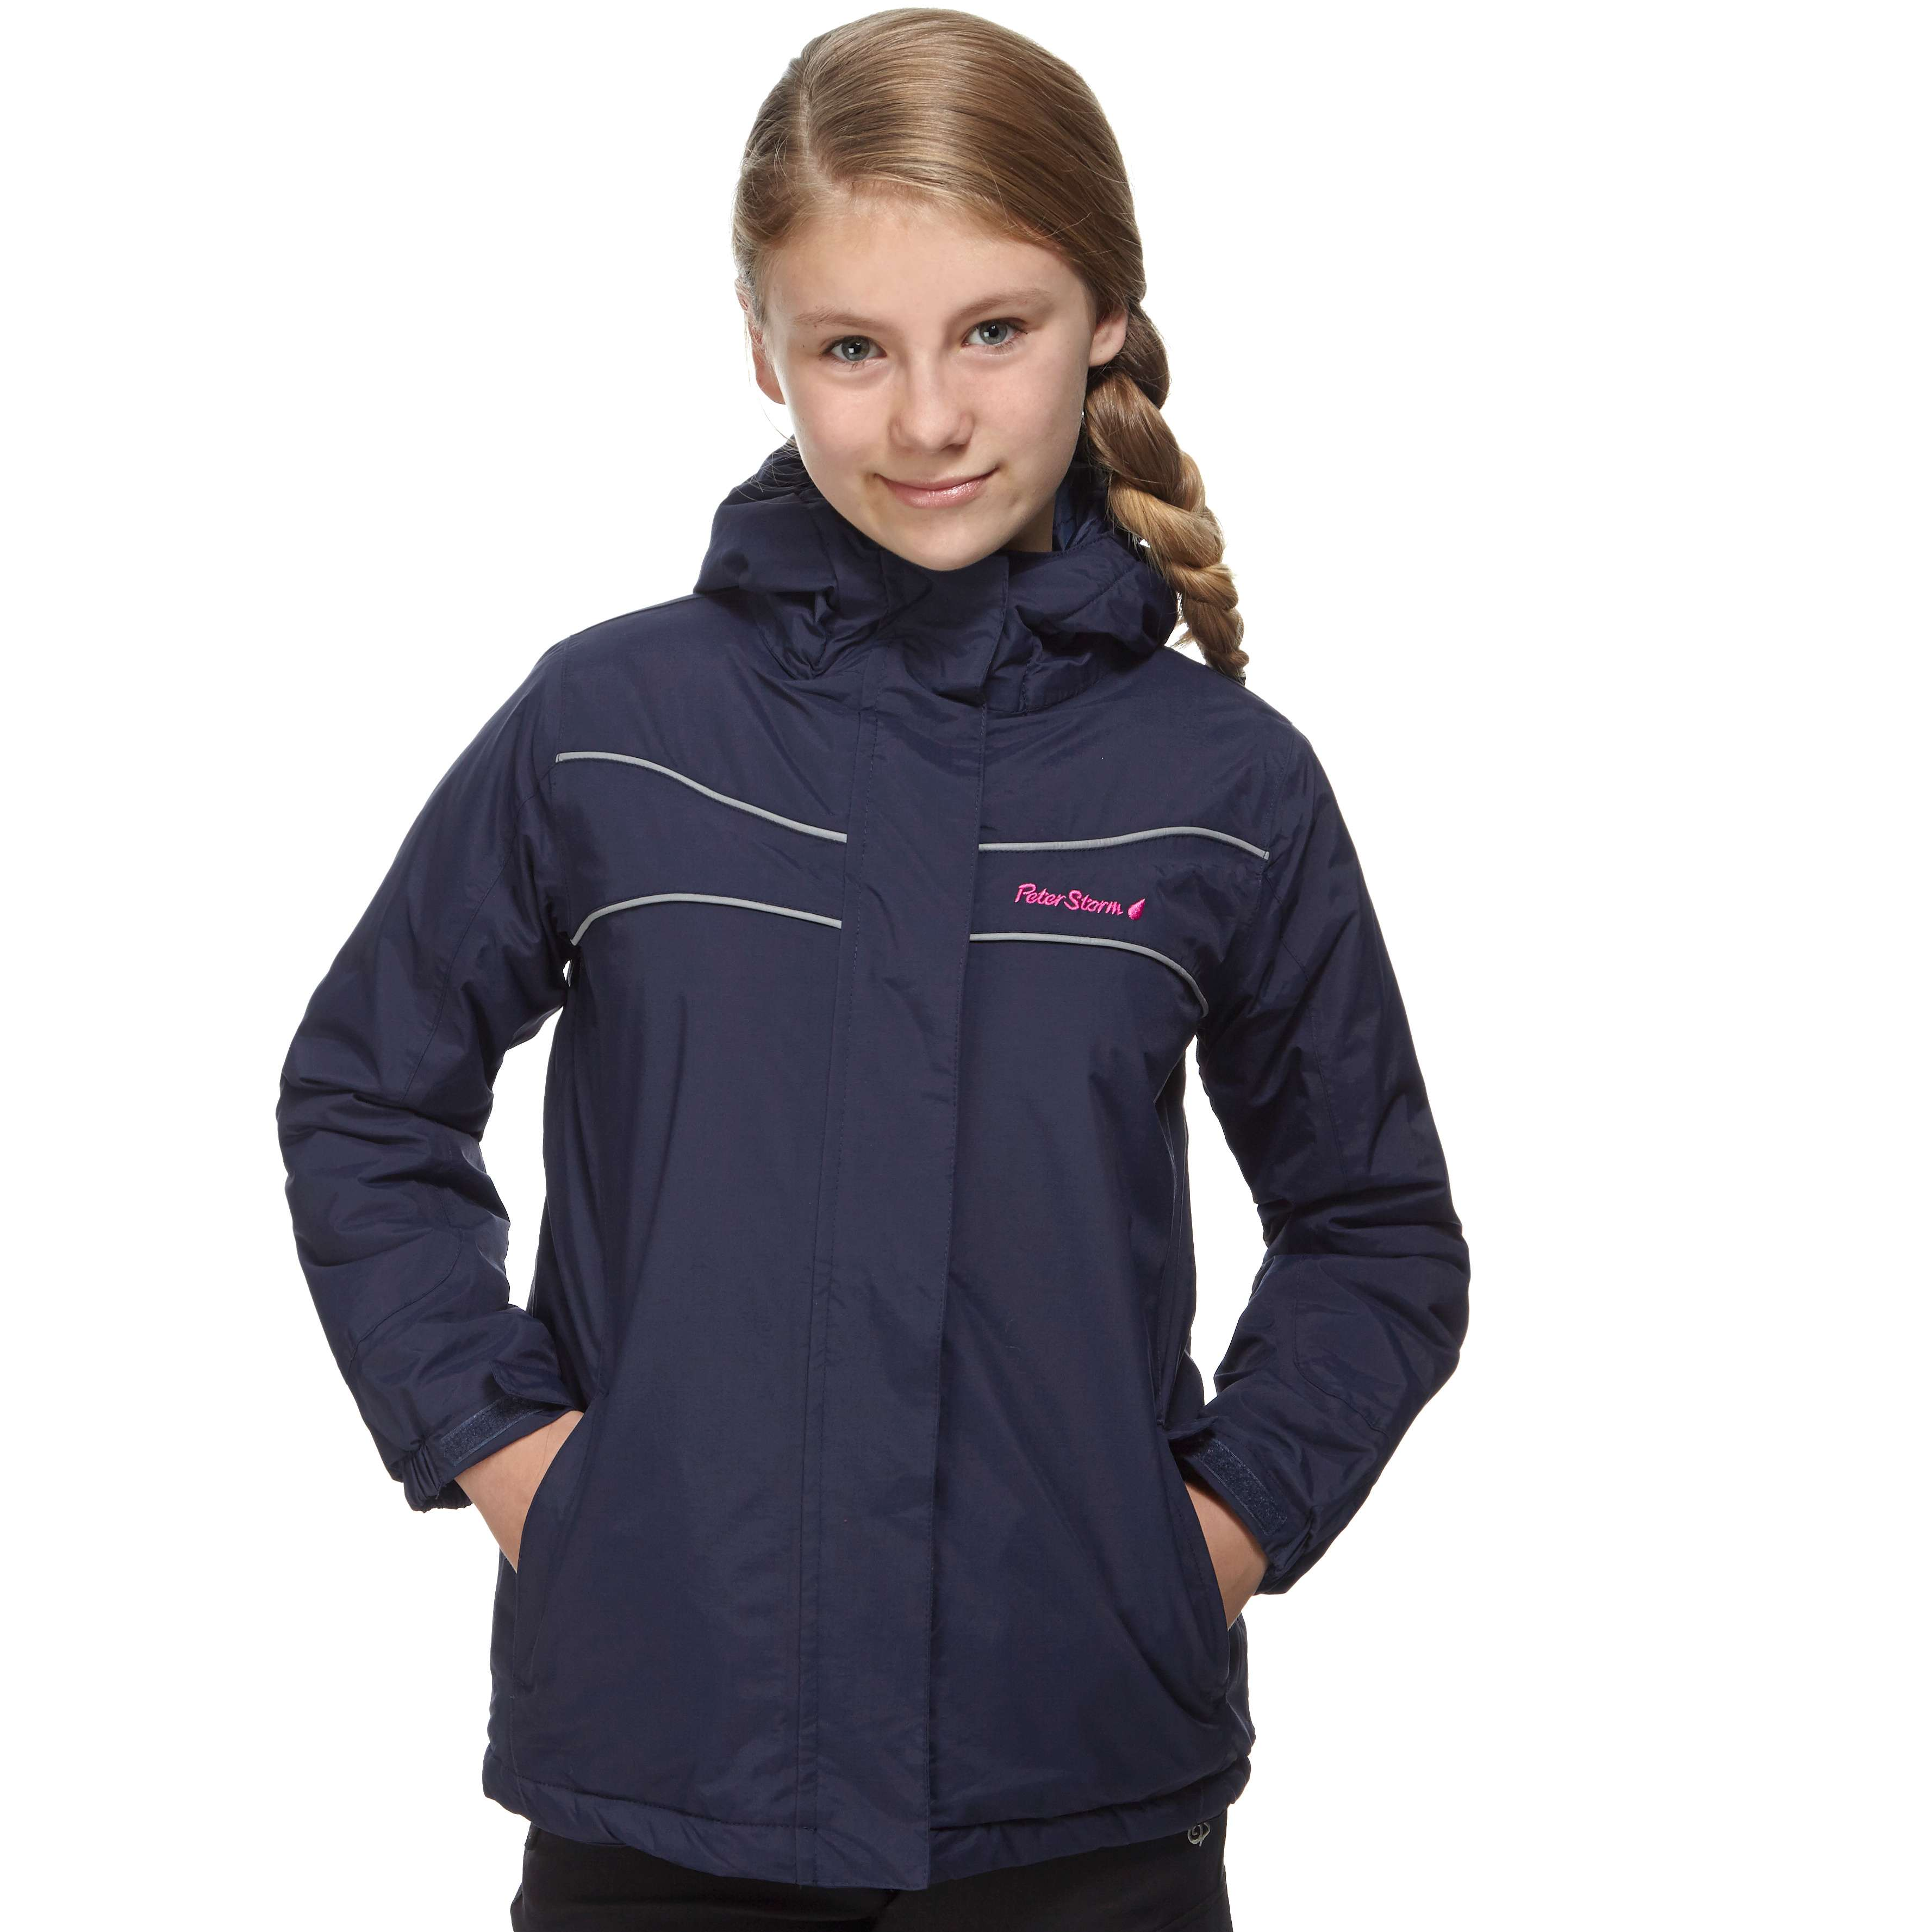 PETER STORM Girls' Insulated Waterproof Jacket